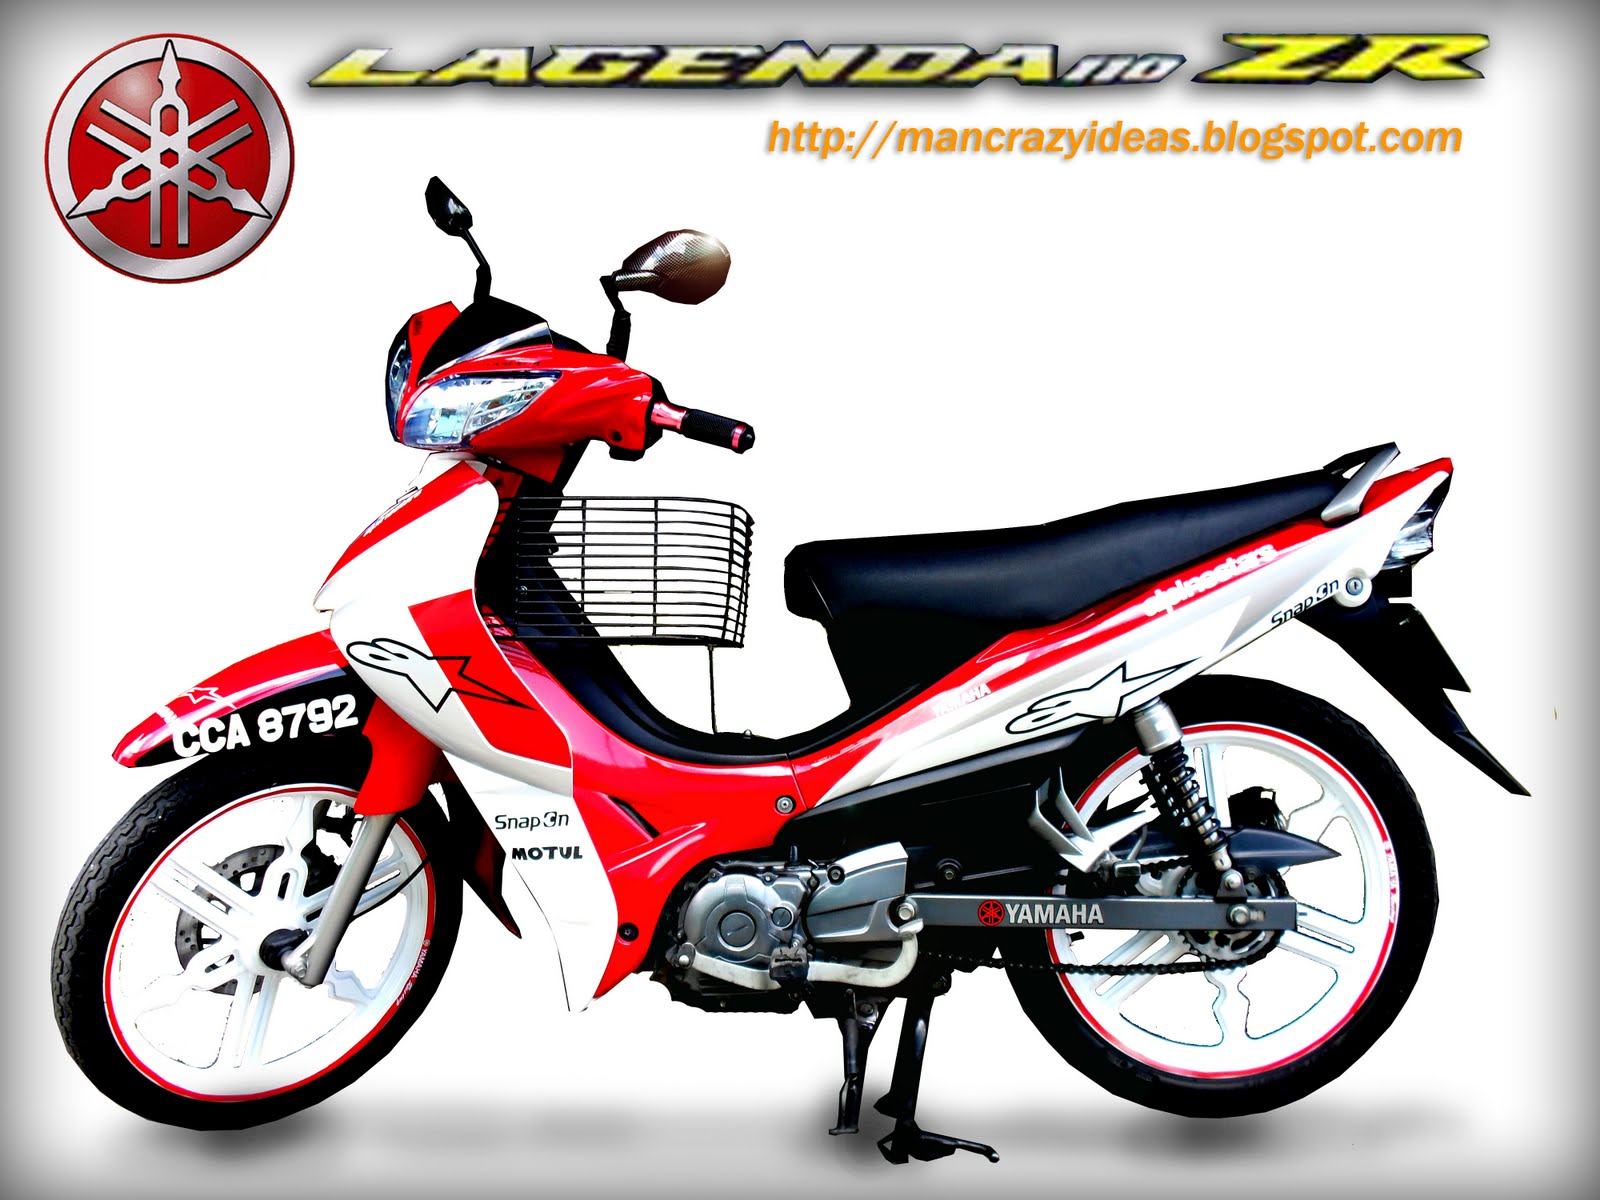 Crazy Ideas: My Yamaha Lagenda